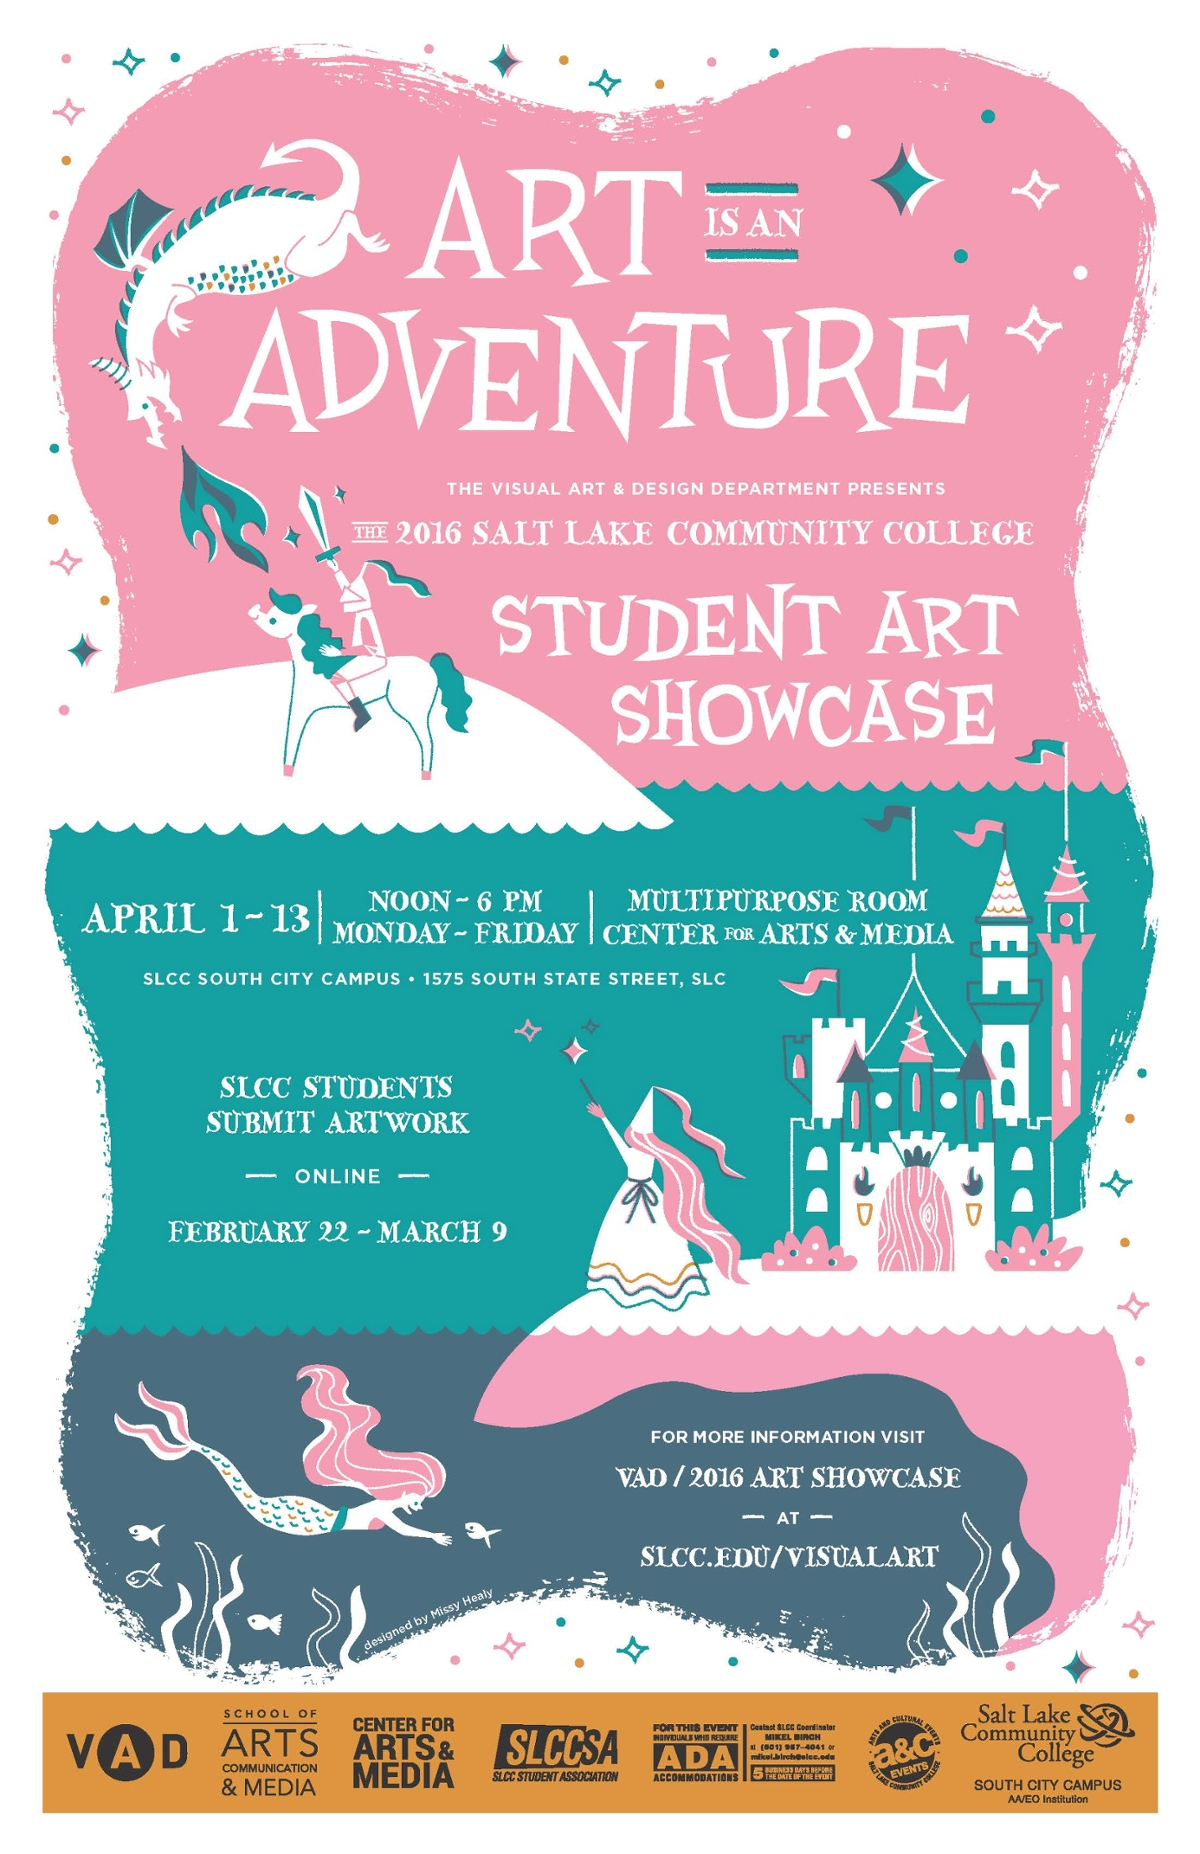 poster slcc student showcase contest winner edu shows adventure